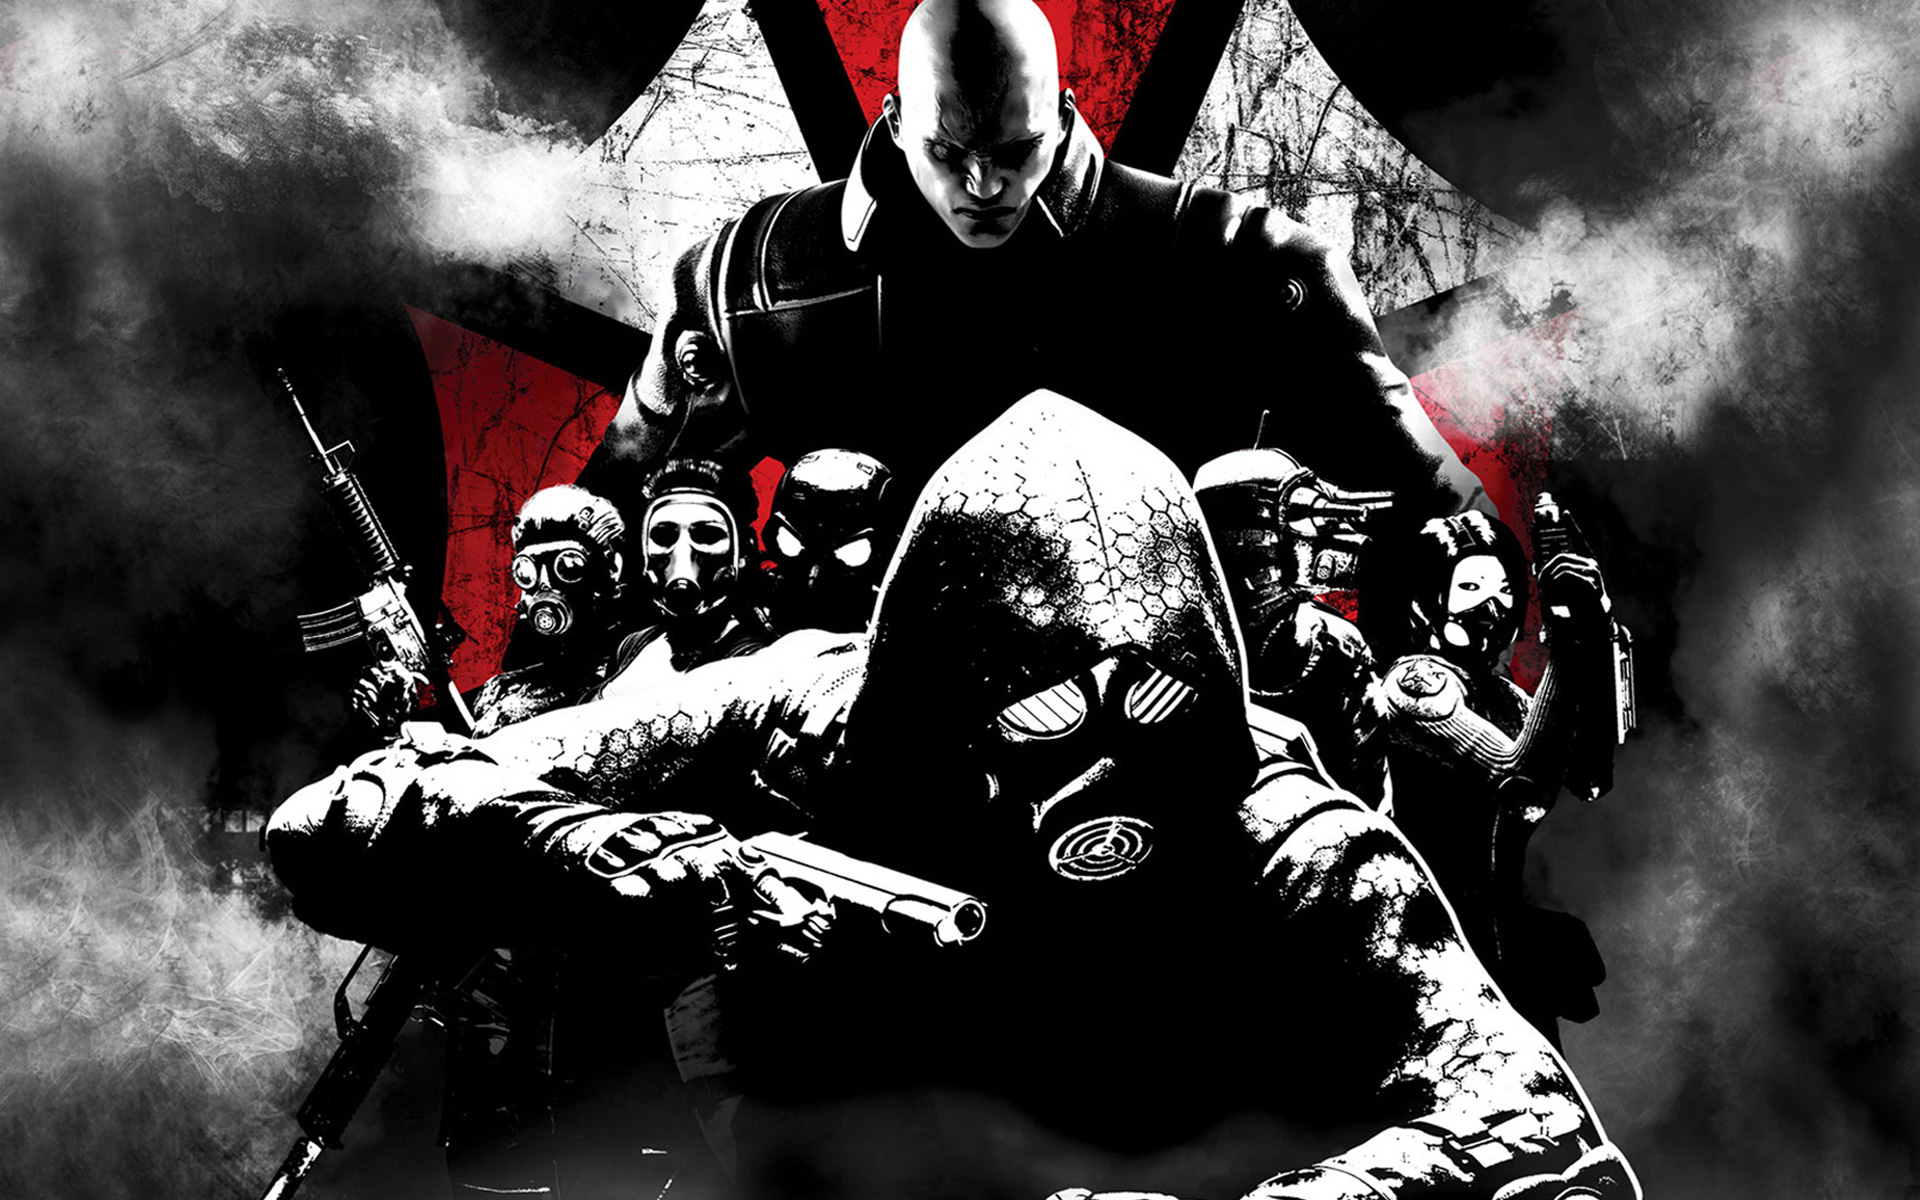 72+ Resident Evil Hd Wallpaper on WallpaperSafari